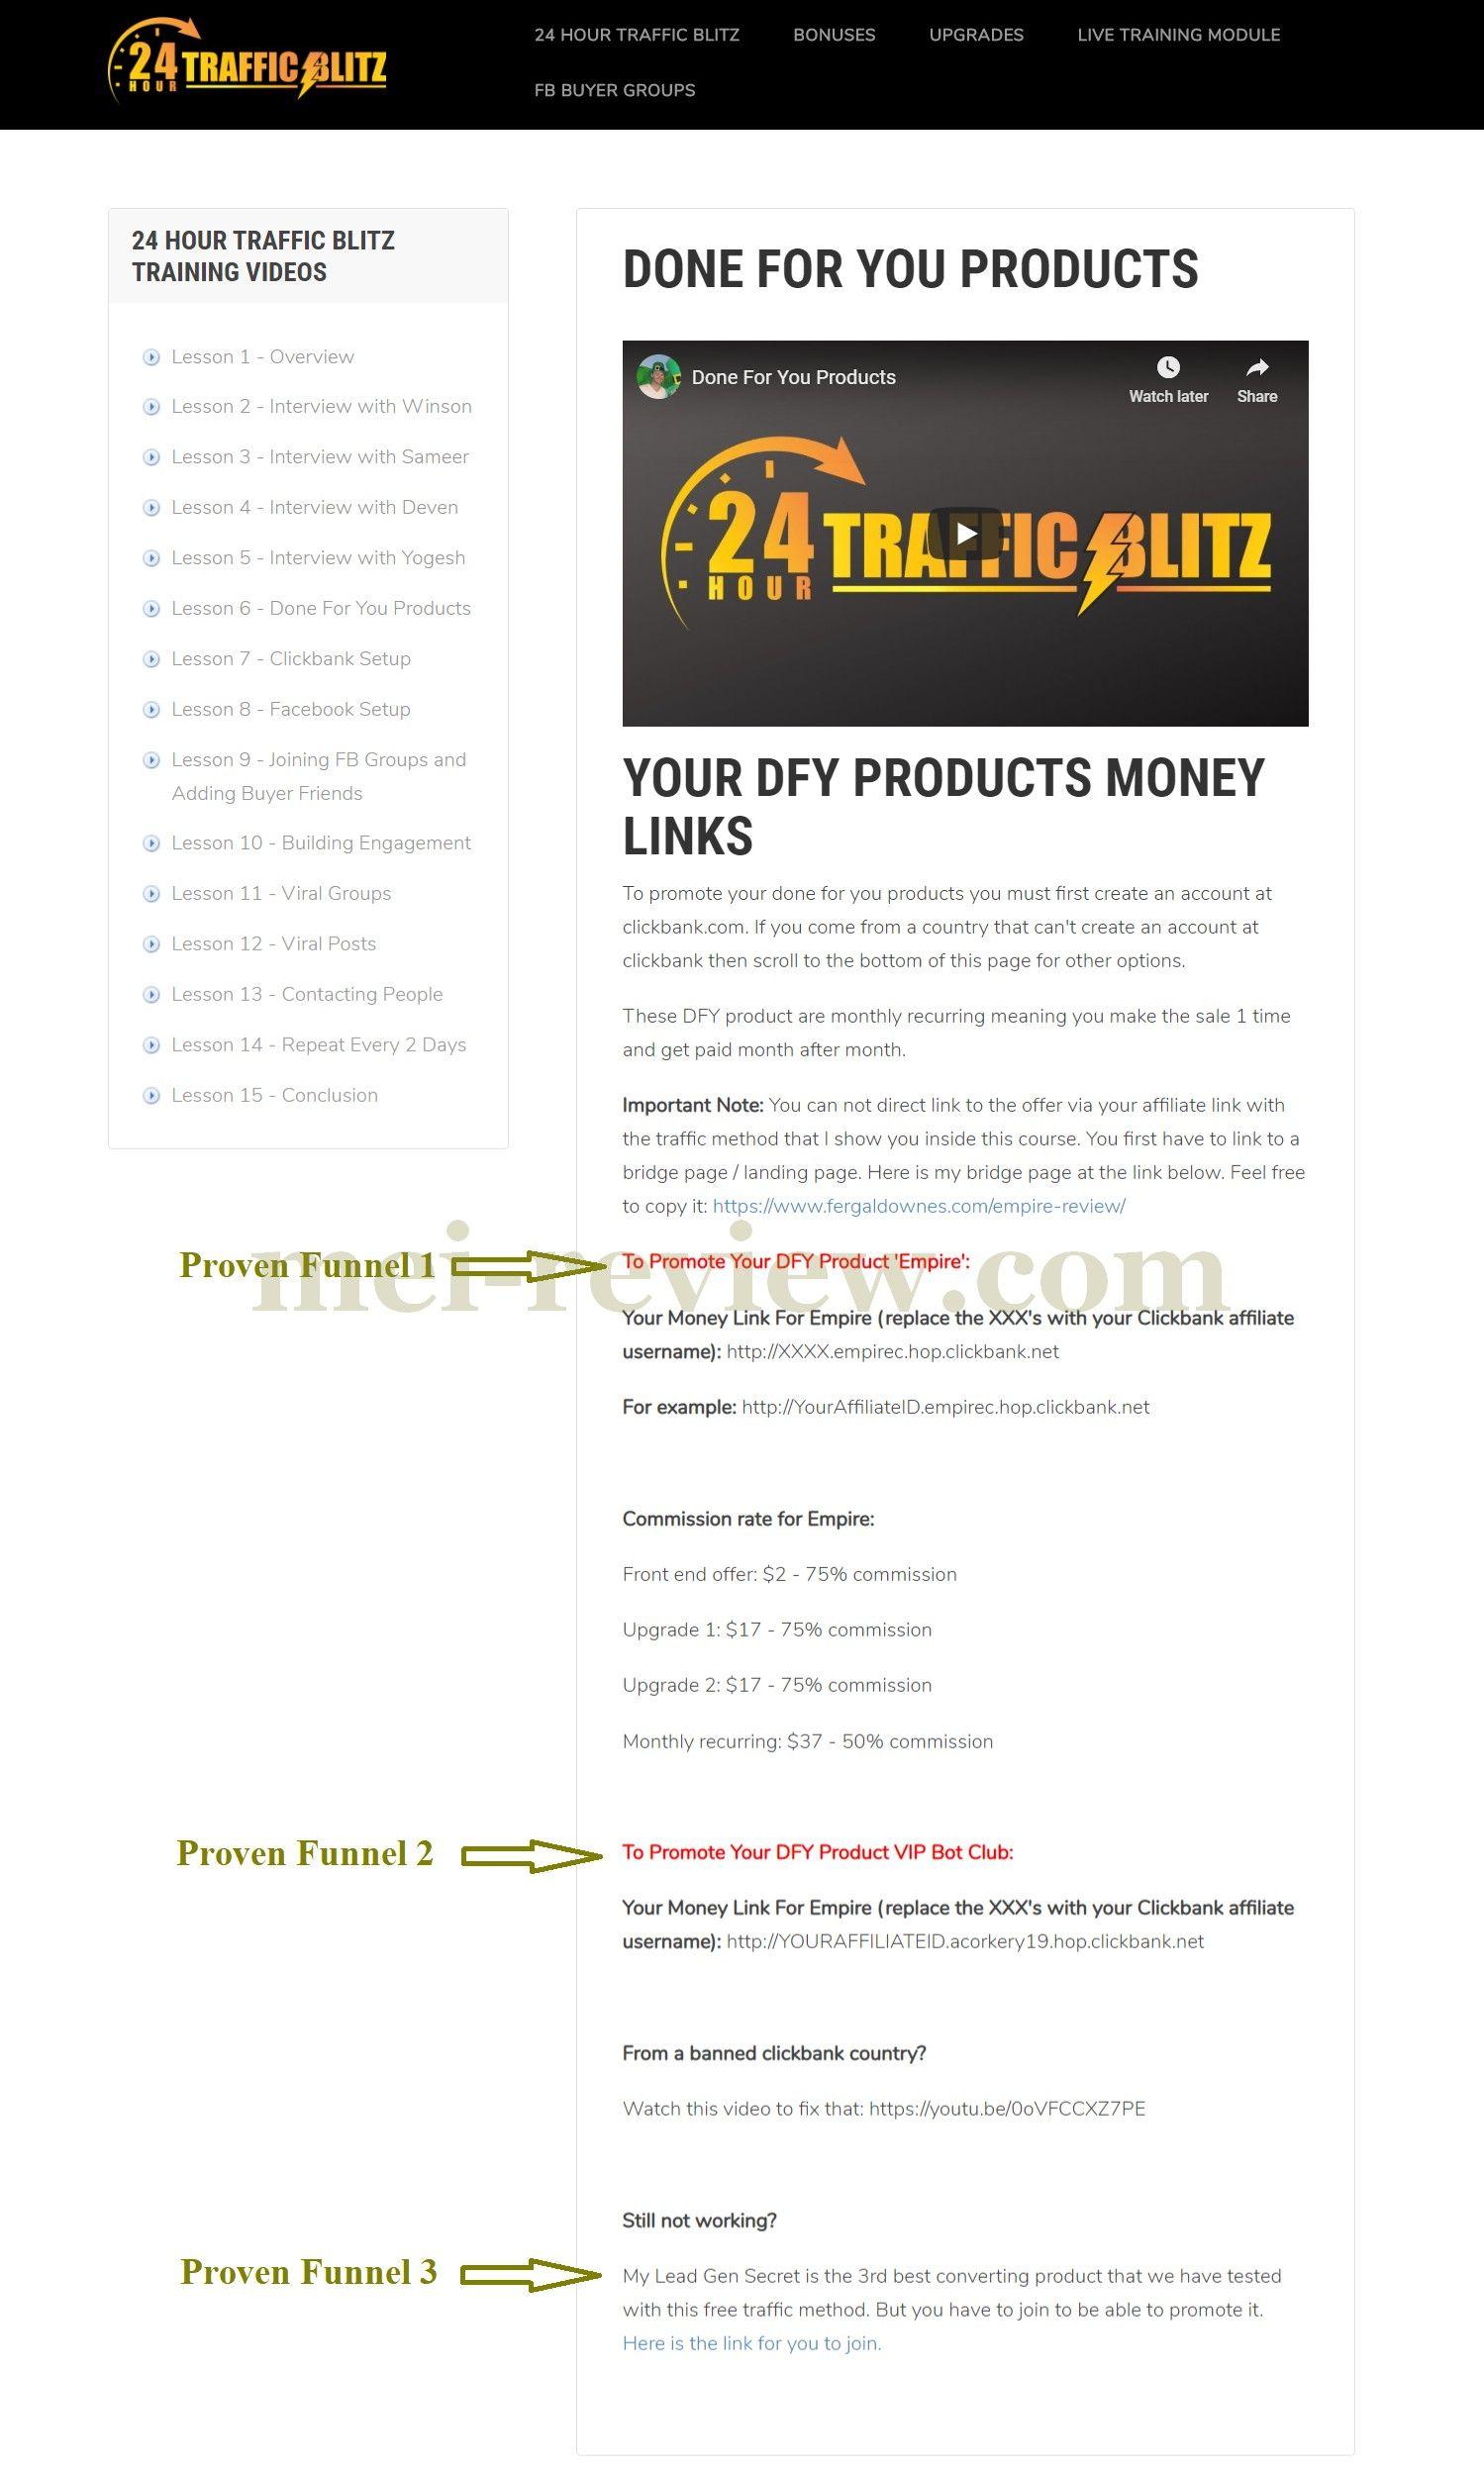 24-Hour-Traffic-Blitz-DFY-Funnel